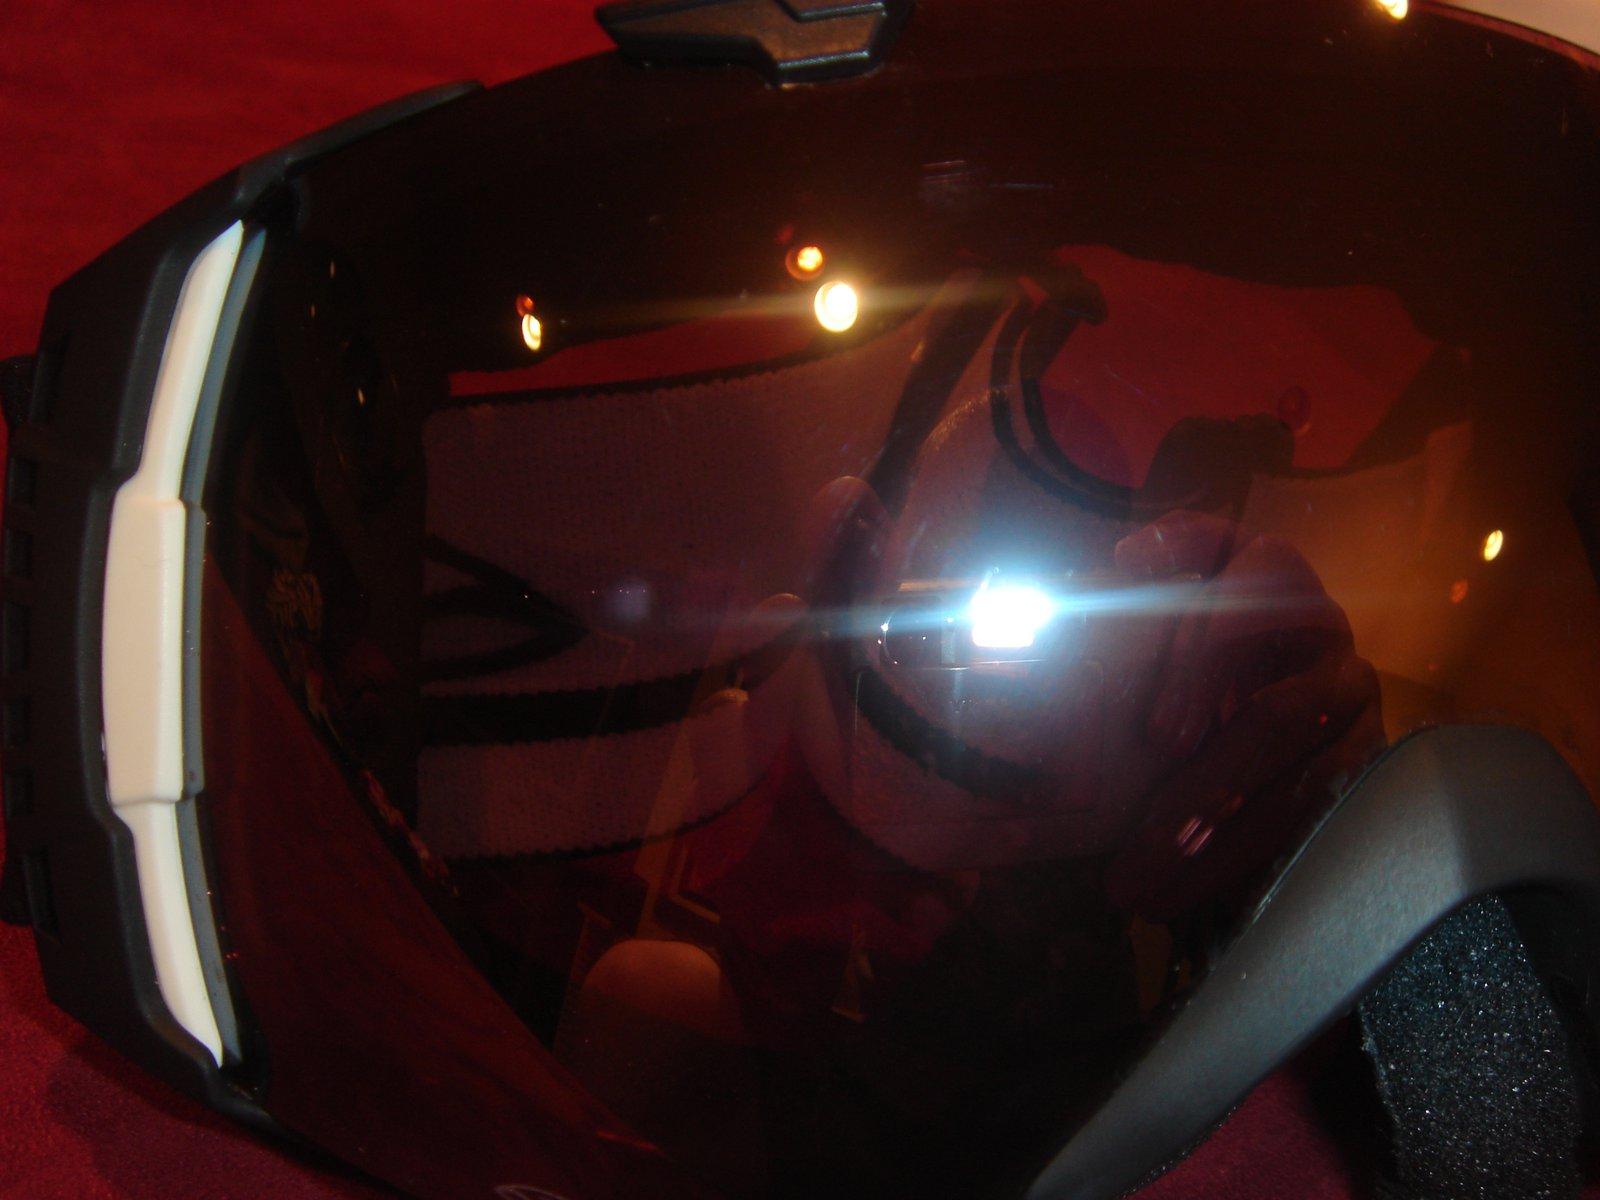 Part of lense